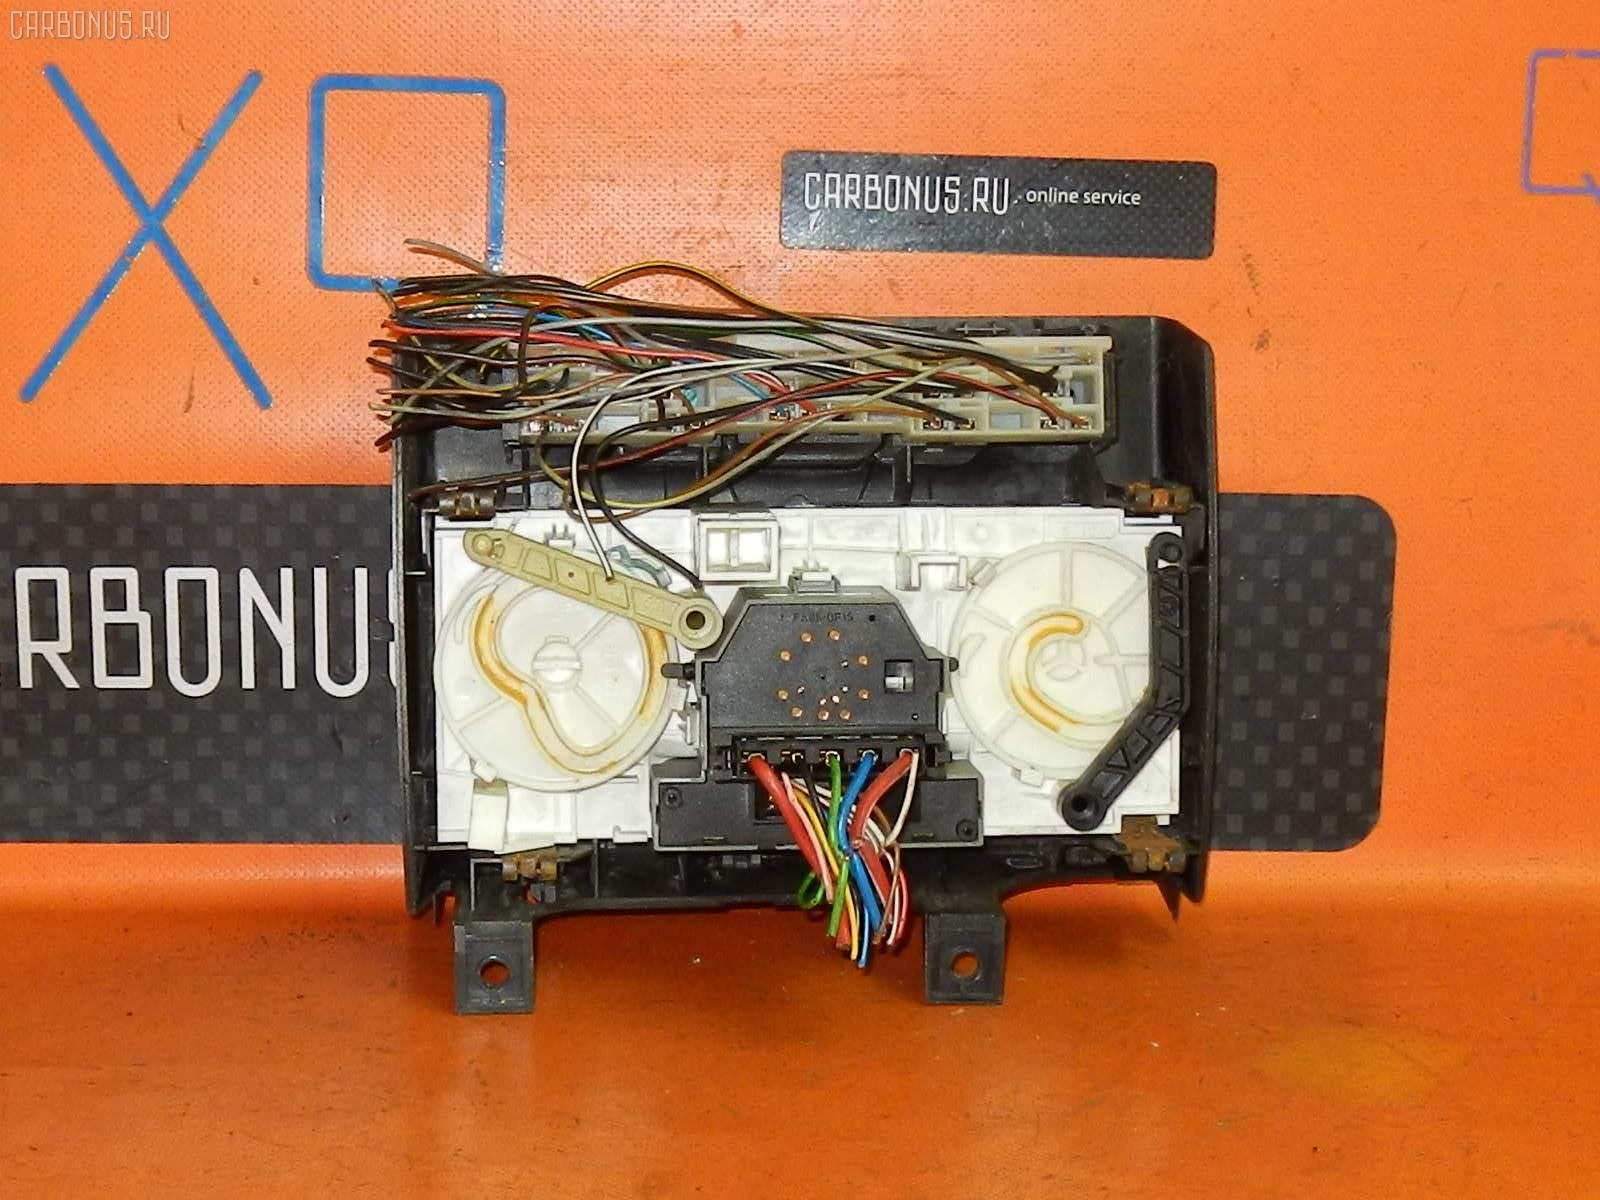 Блок управления климатконтроля SUBARU TRAVIQ XM220 Z22SE Фото 2